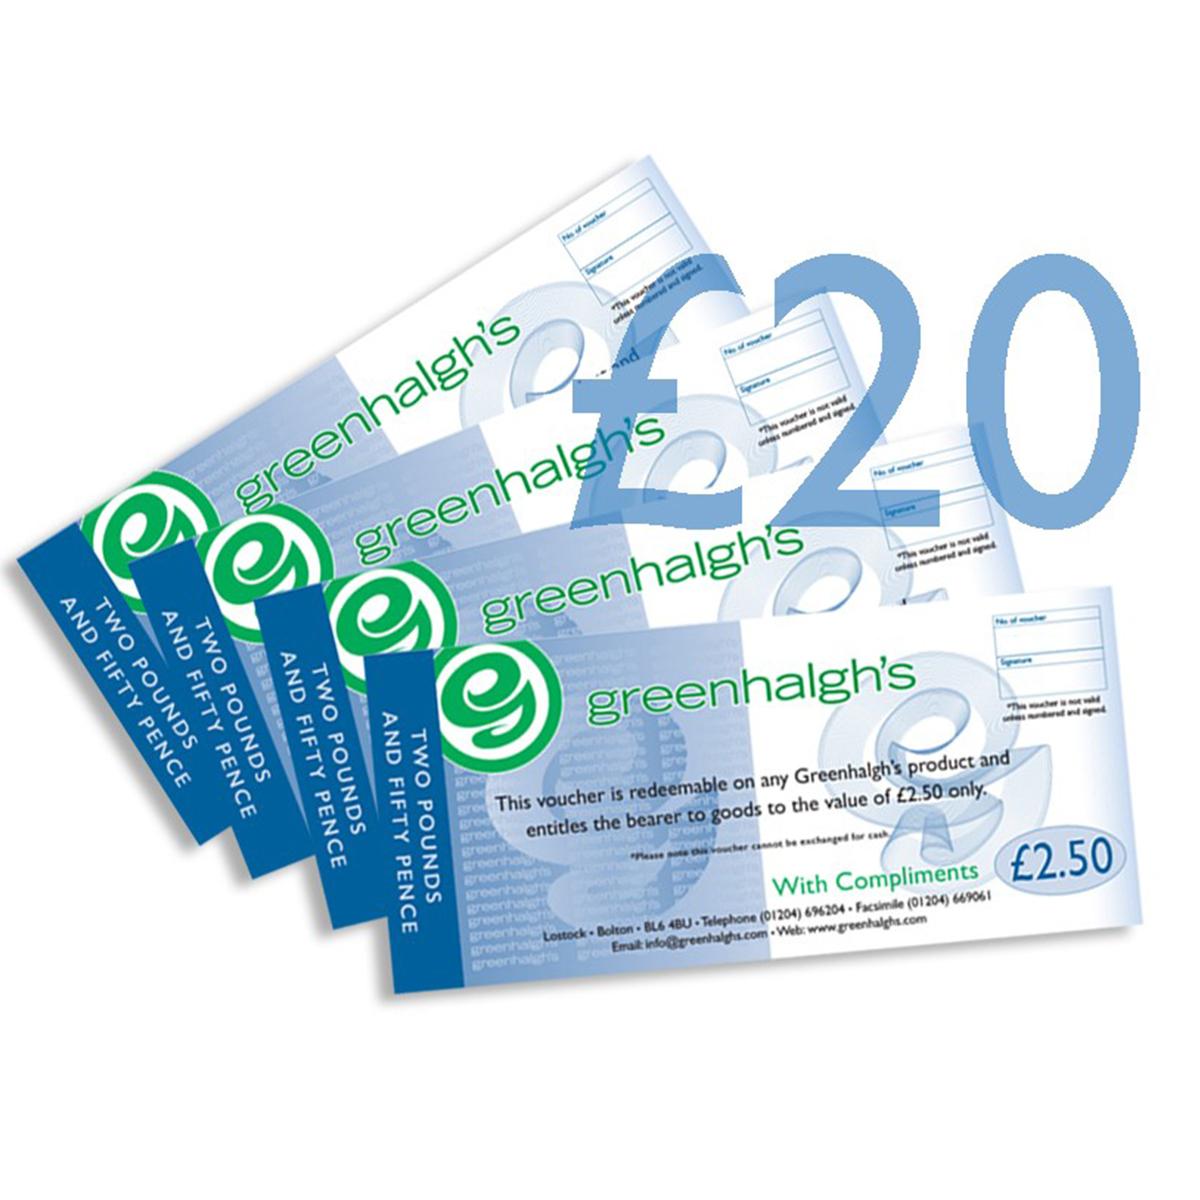 vouchers gift £20 99002